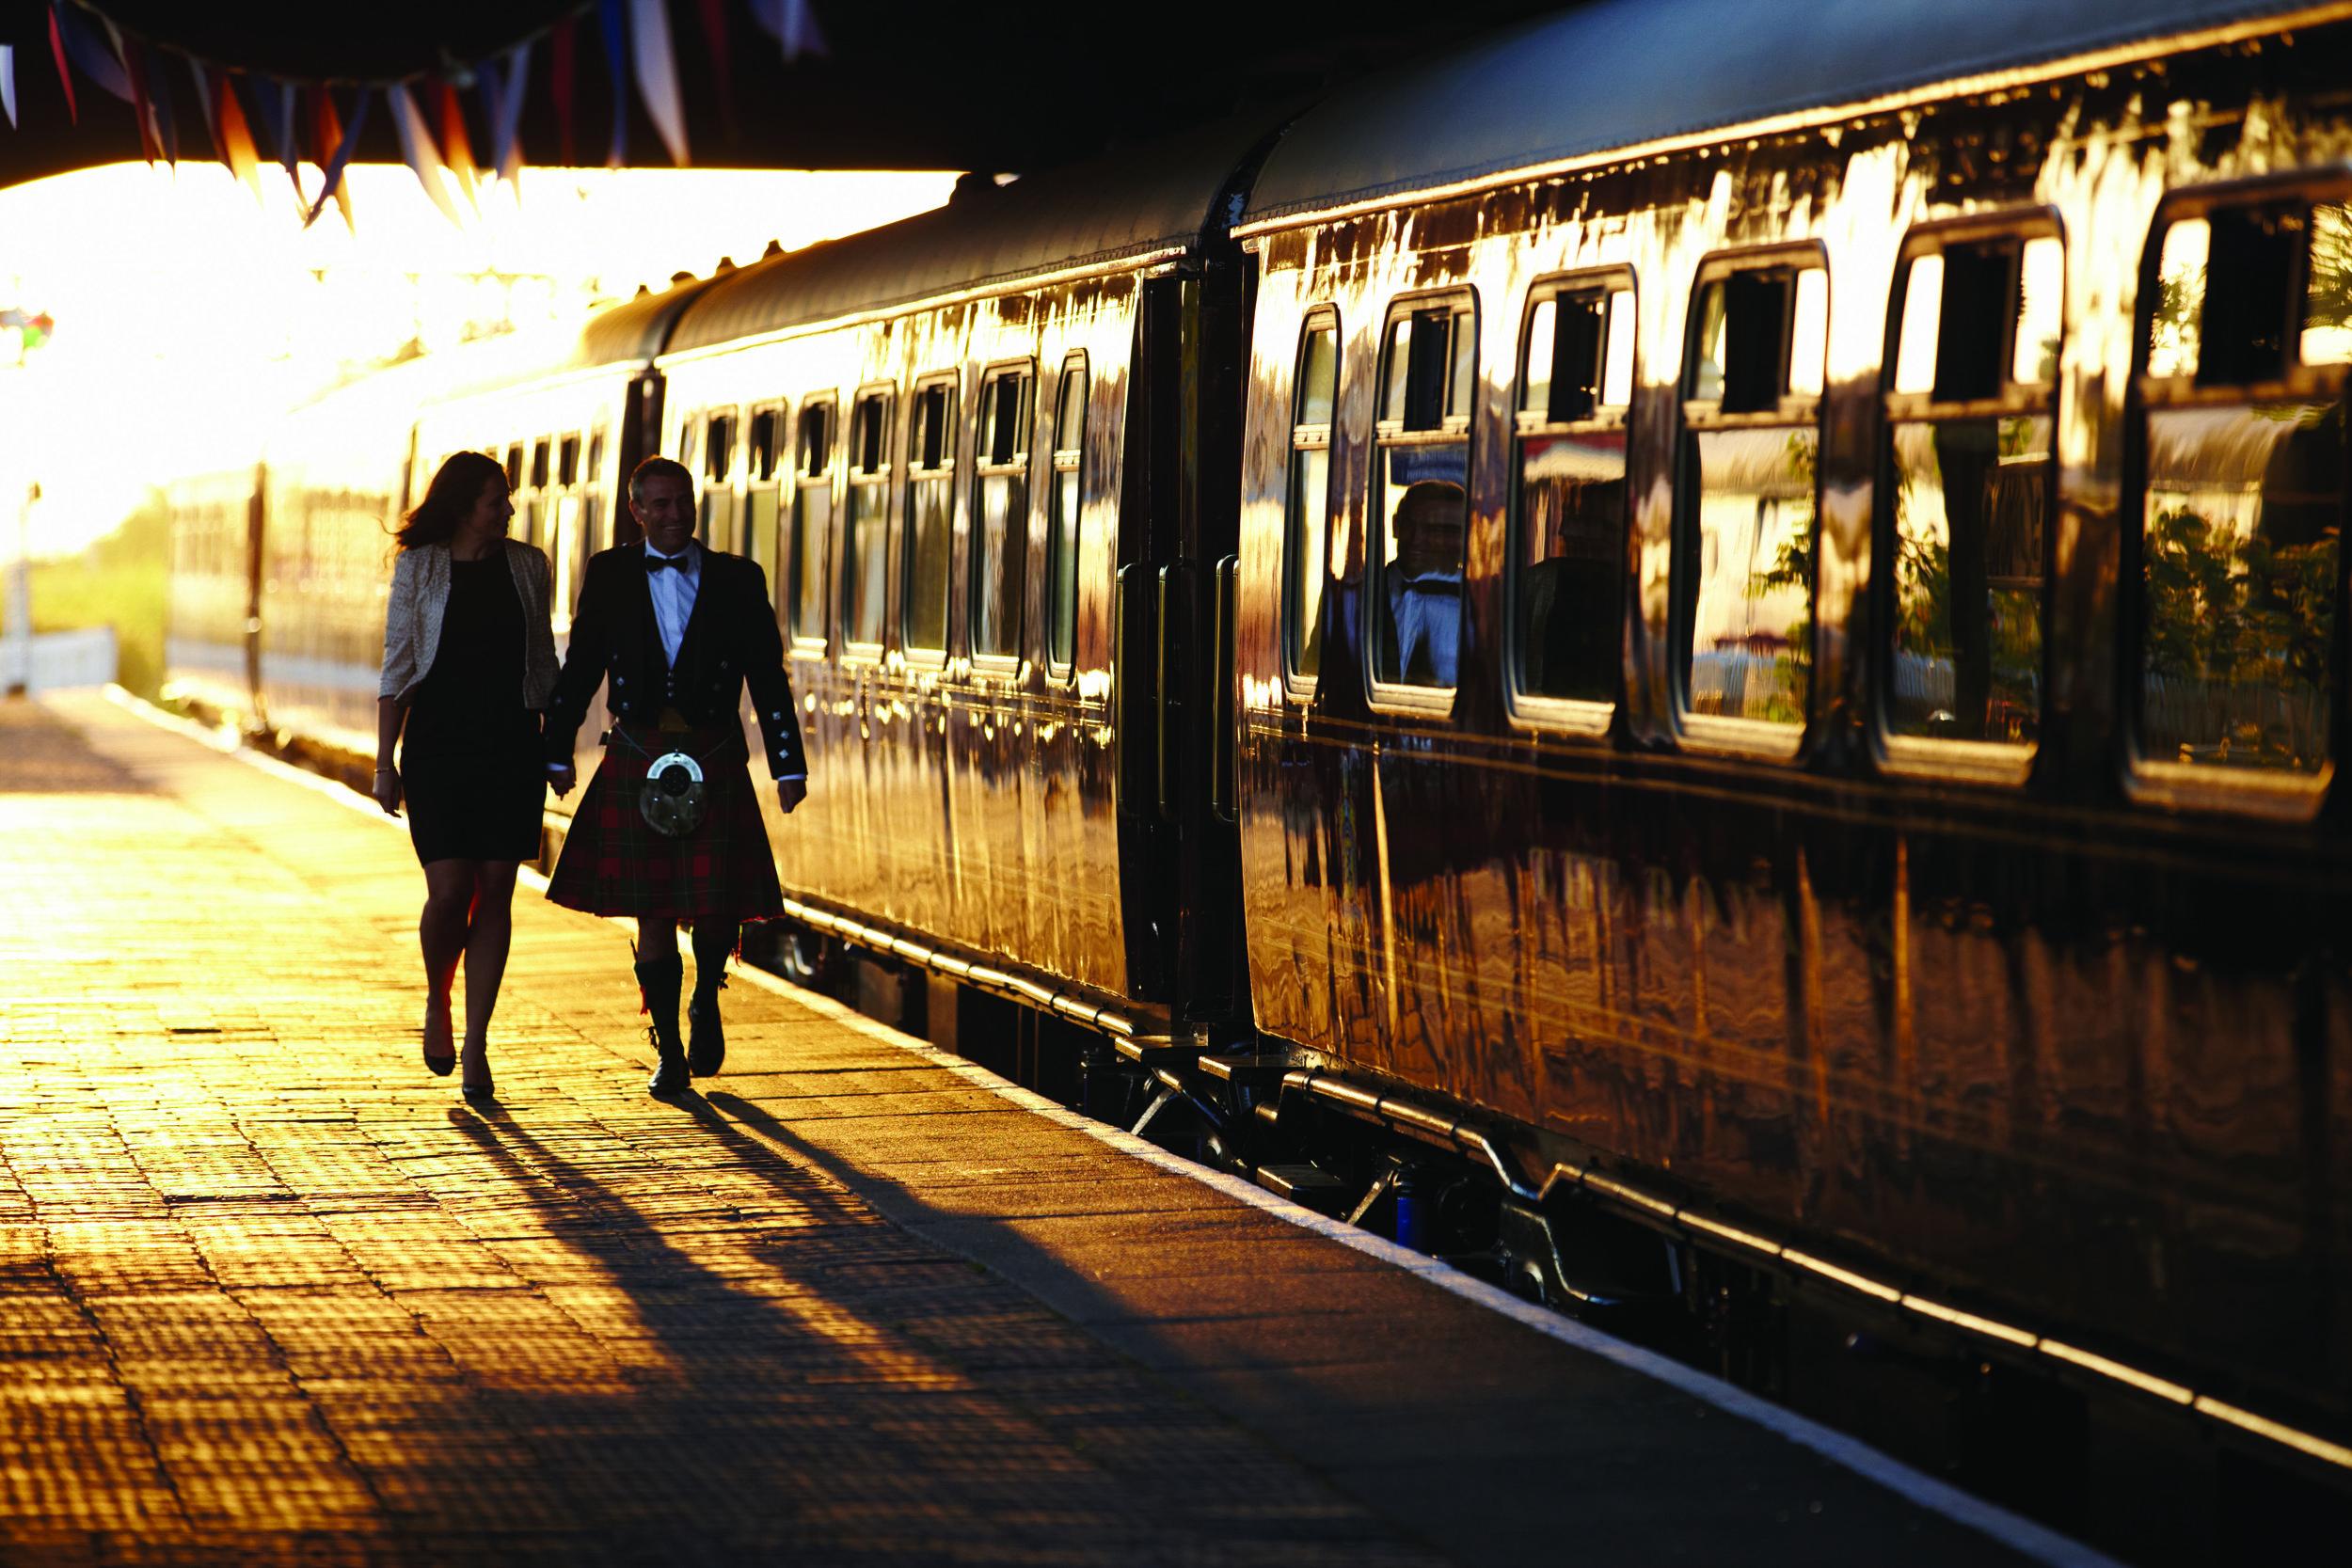 The Royal Scotsman Train